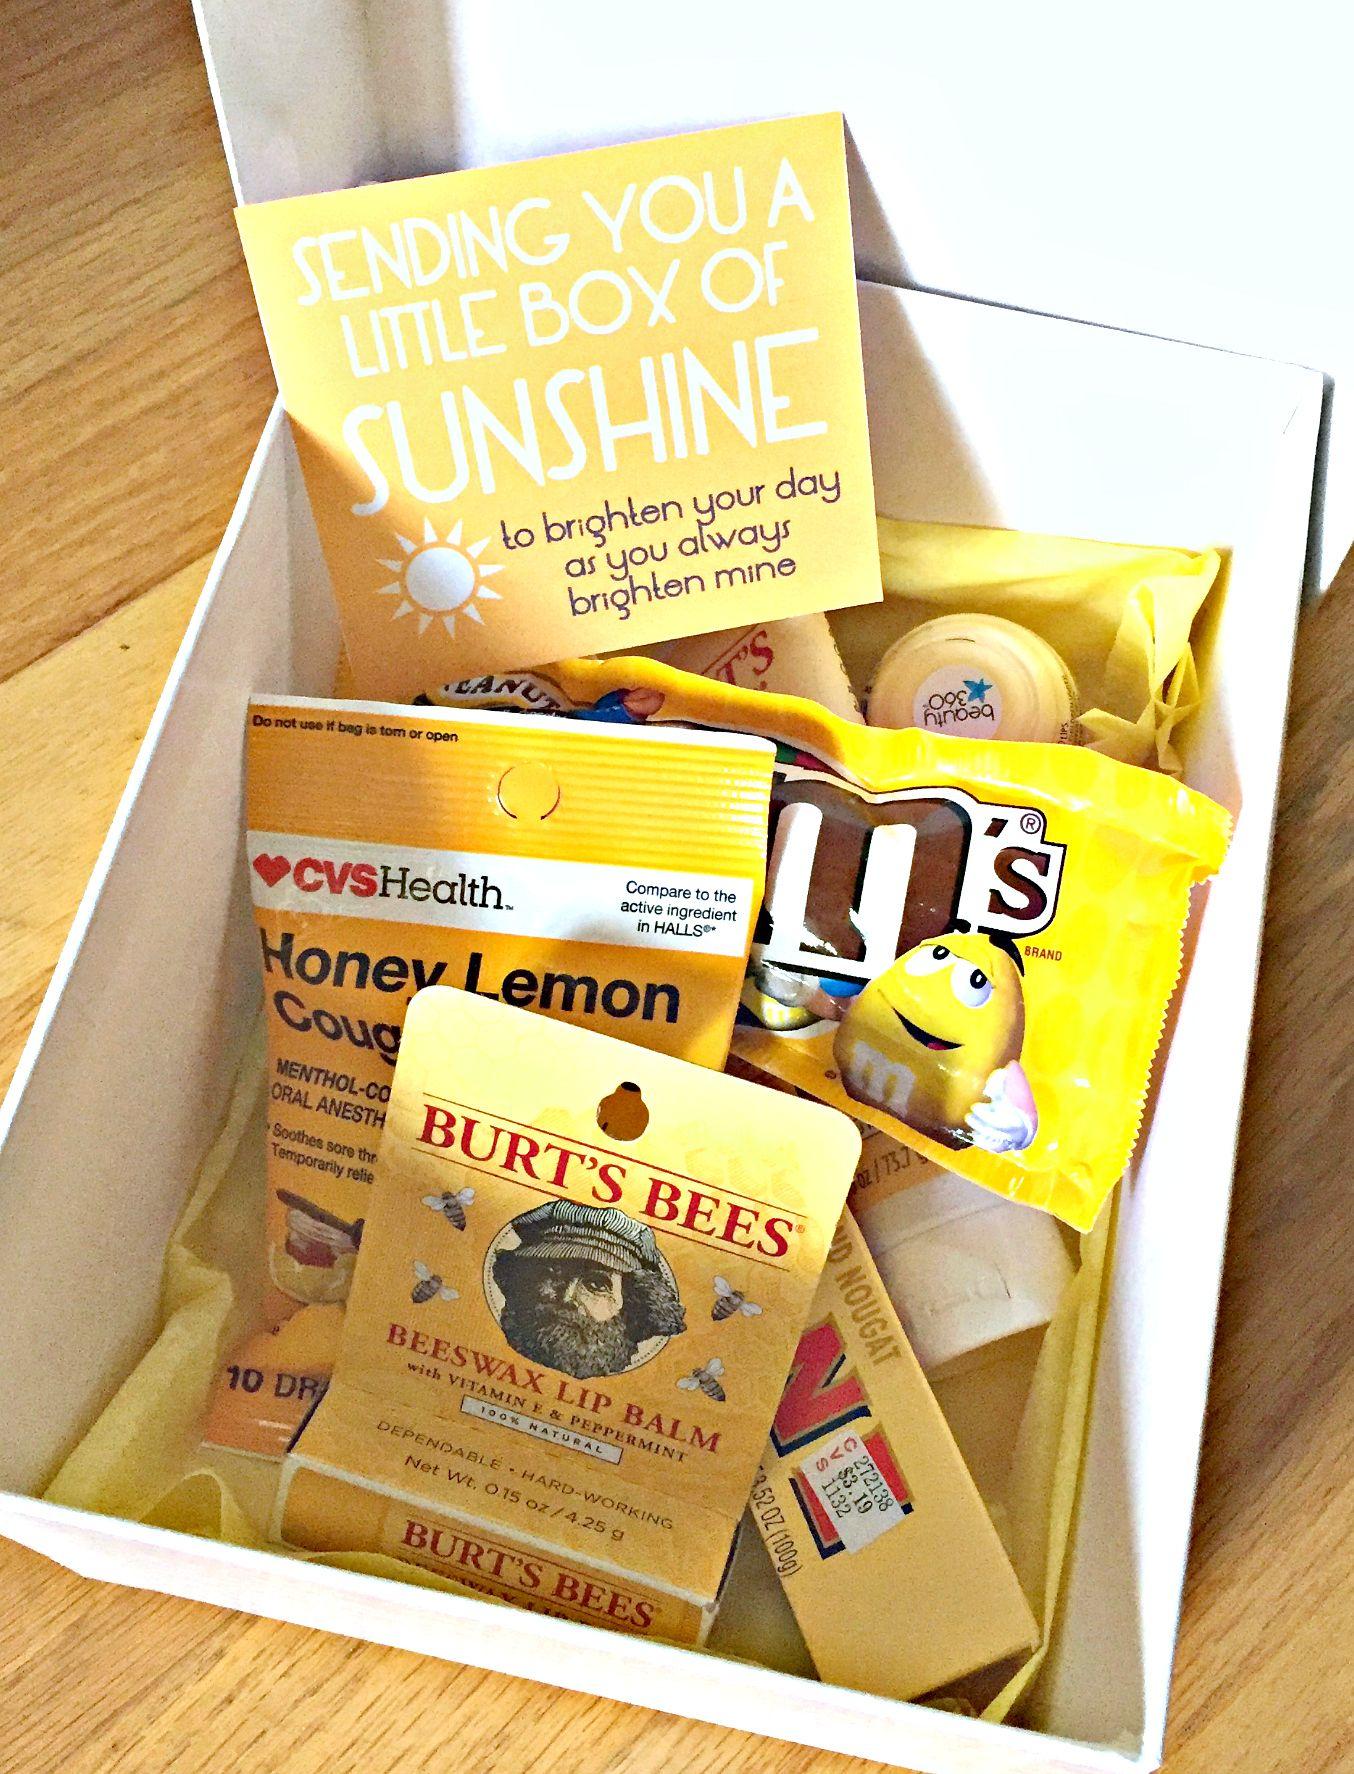 Send A Friend A Little Box Of Sunshine To Brighten Their